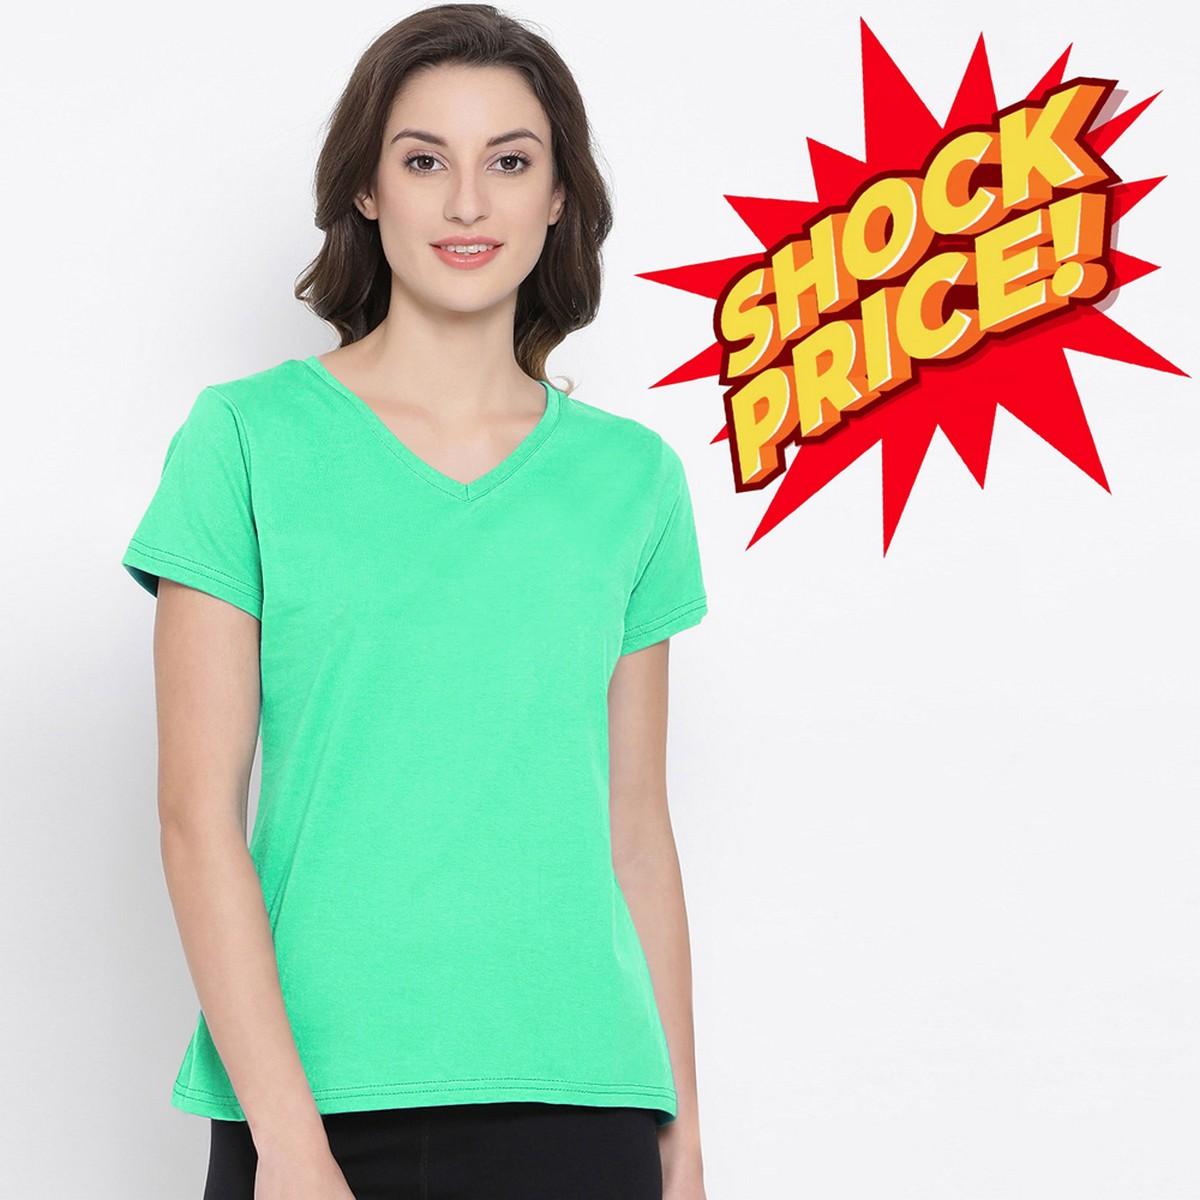 PA Women (BG-5-iv) V-Neck T-Shirt